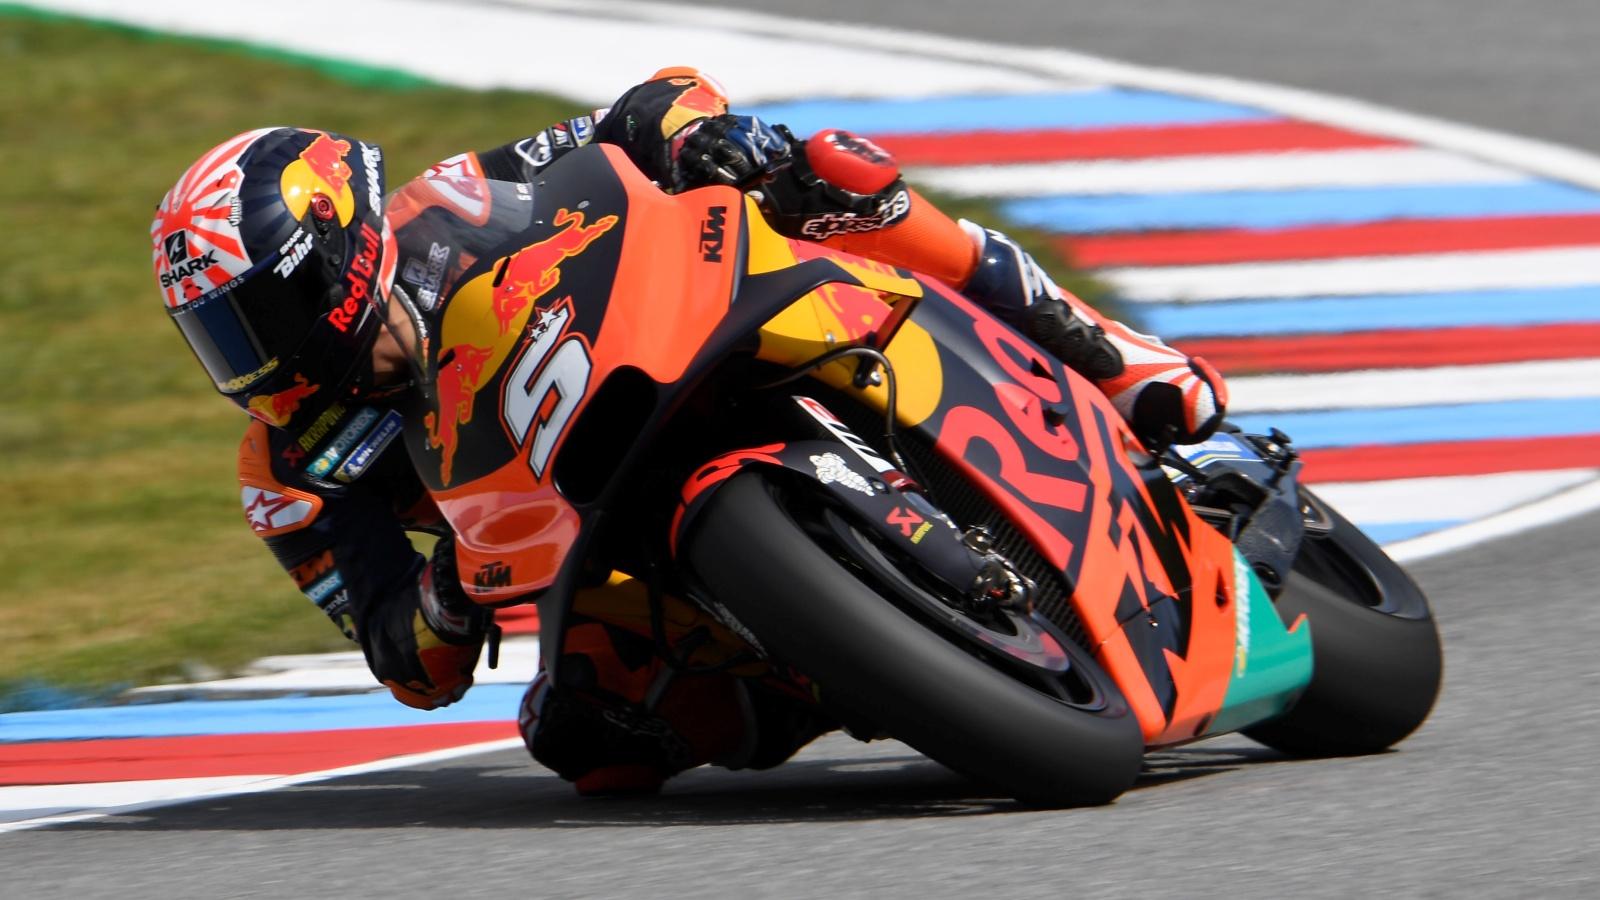 KTM anuncia que Johann Zarco no seguirá en MotoGP 2020